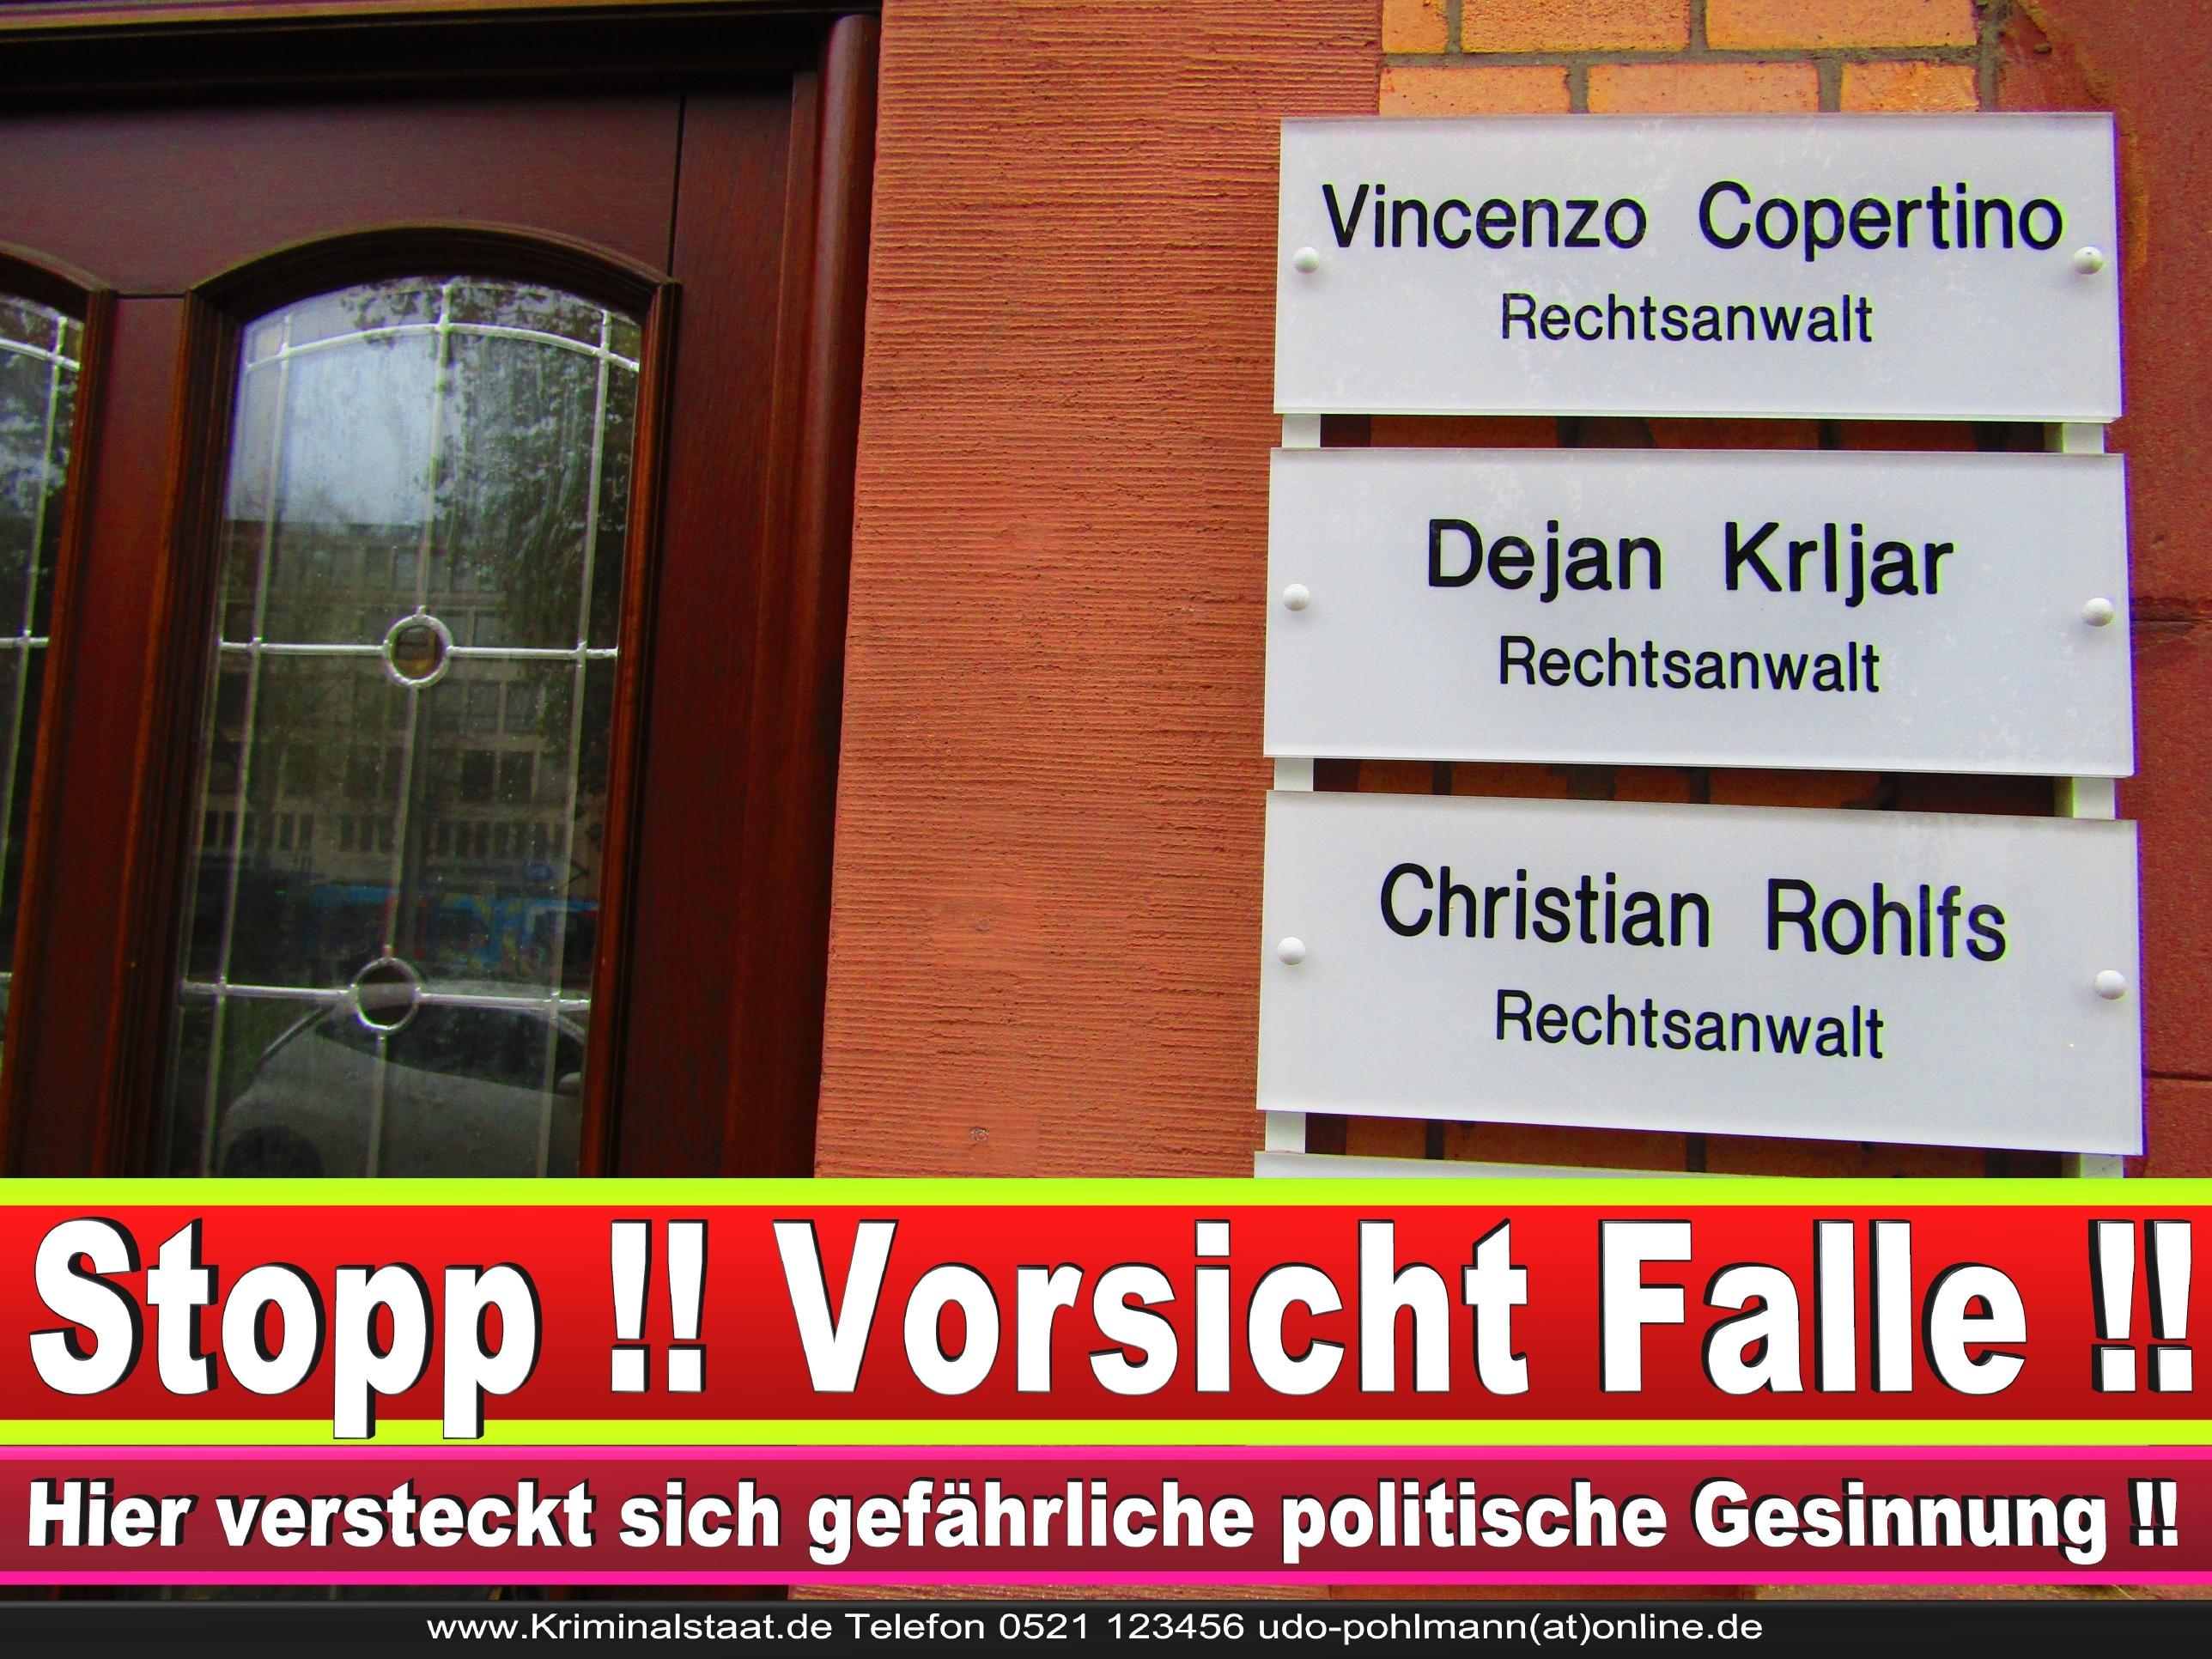 Rechtsanwalt Vincenzo Copertino Bielefeld Vincenzo Copertino Rechtsanwalt Siekerwall 7 33602 Bielefeld 3